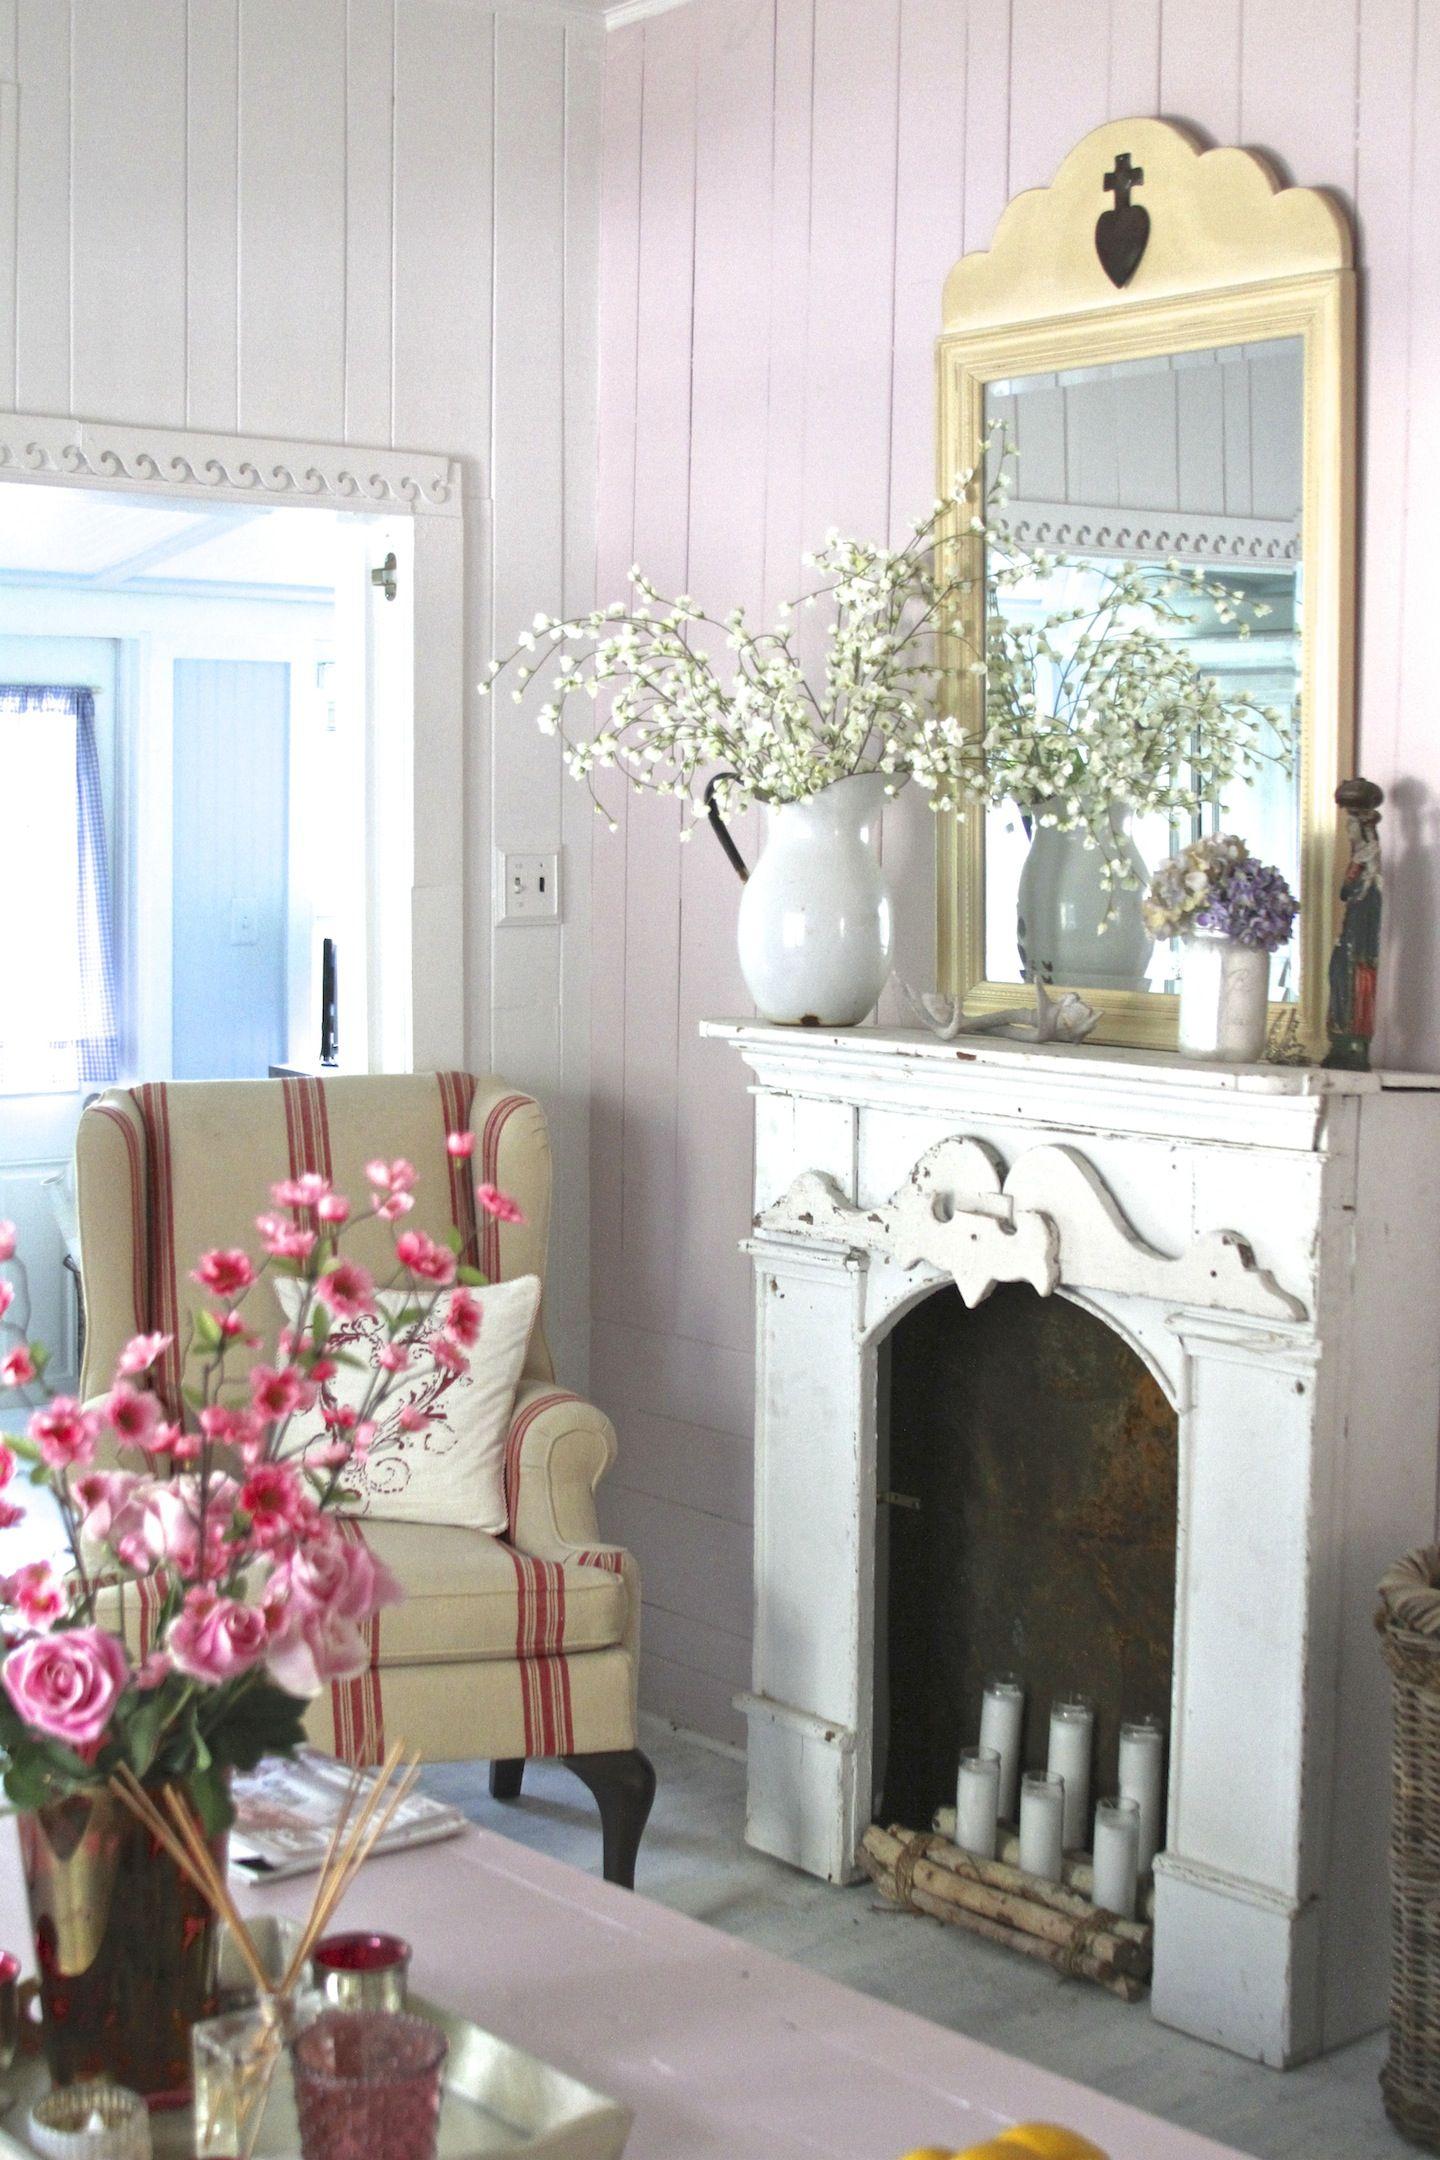 fireplace mantel,mirror, pitcher, ticking armchair